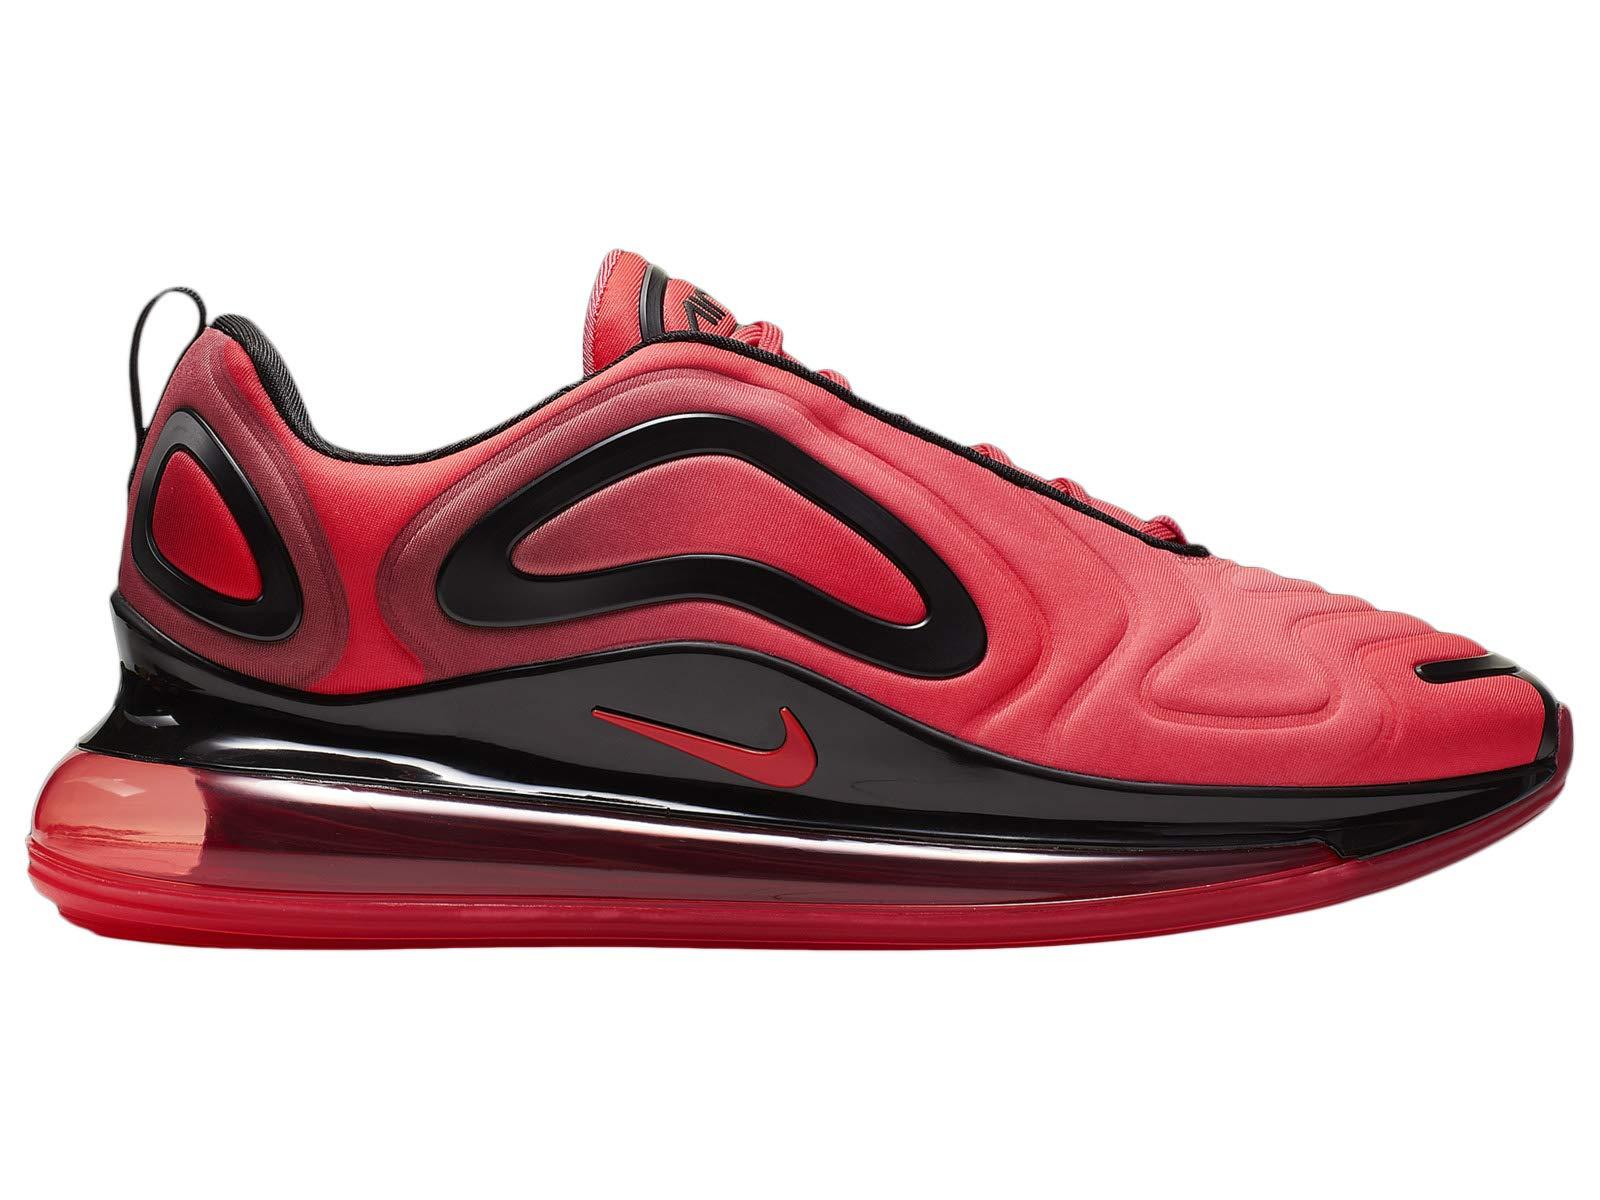 718WklHvPdL - Nike Men's Air Max 720 Bright Crimson/Black/Ember Glow Mesh Running Shoes 10 M US